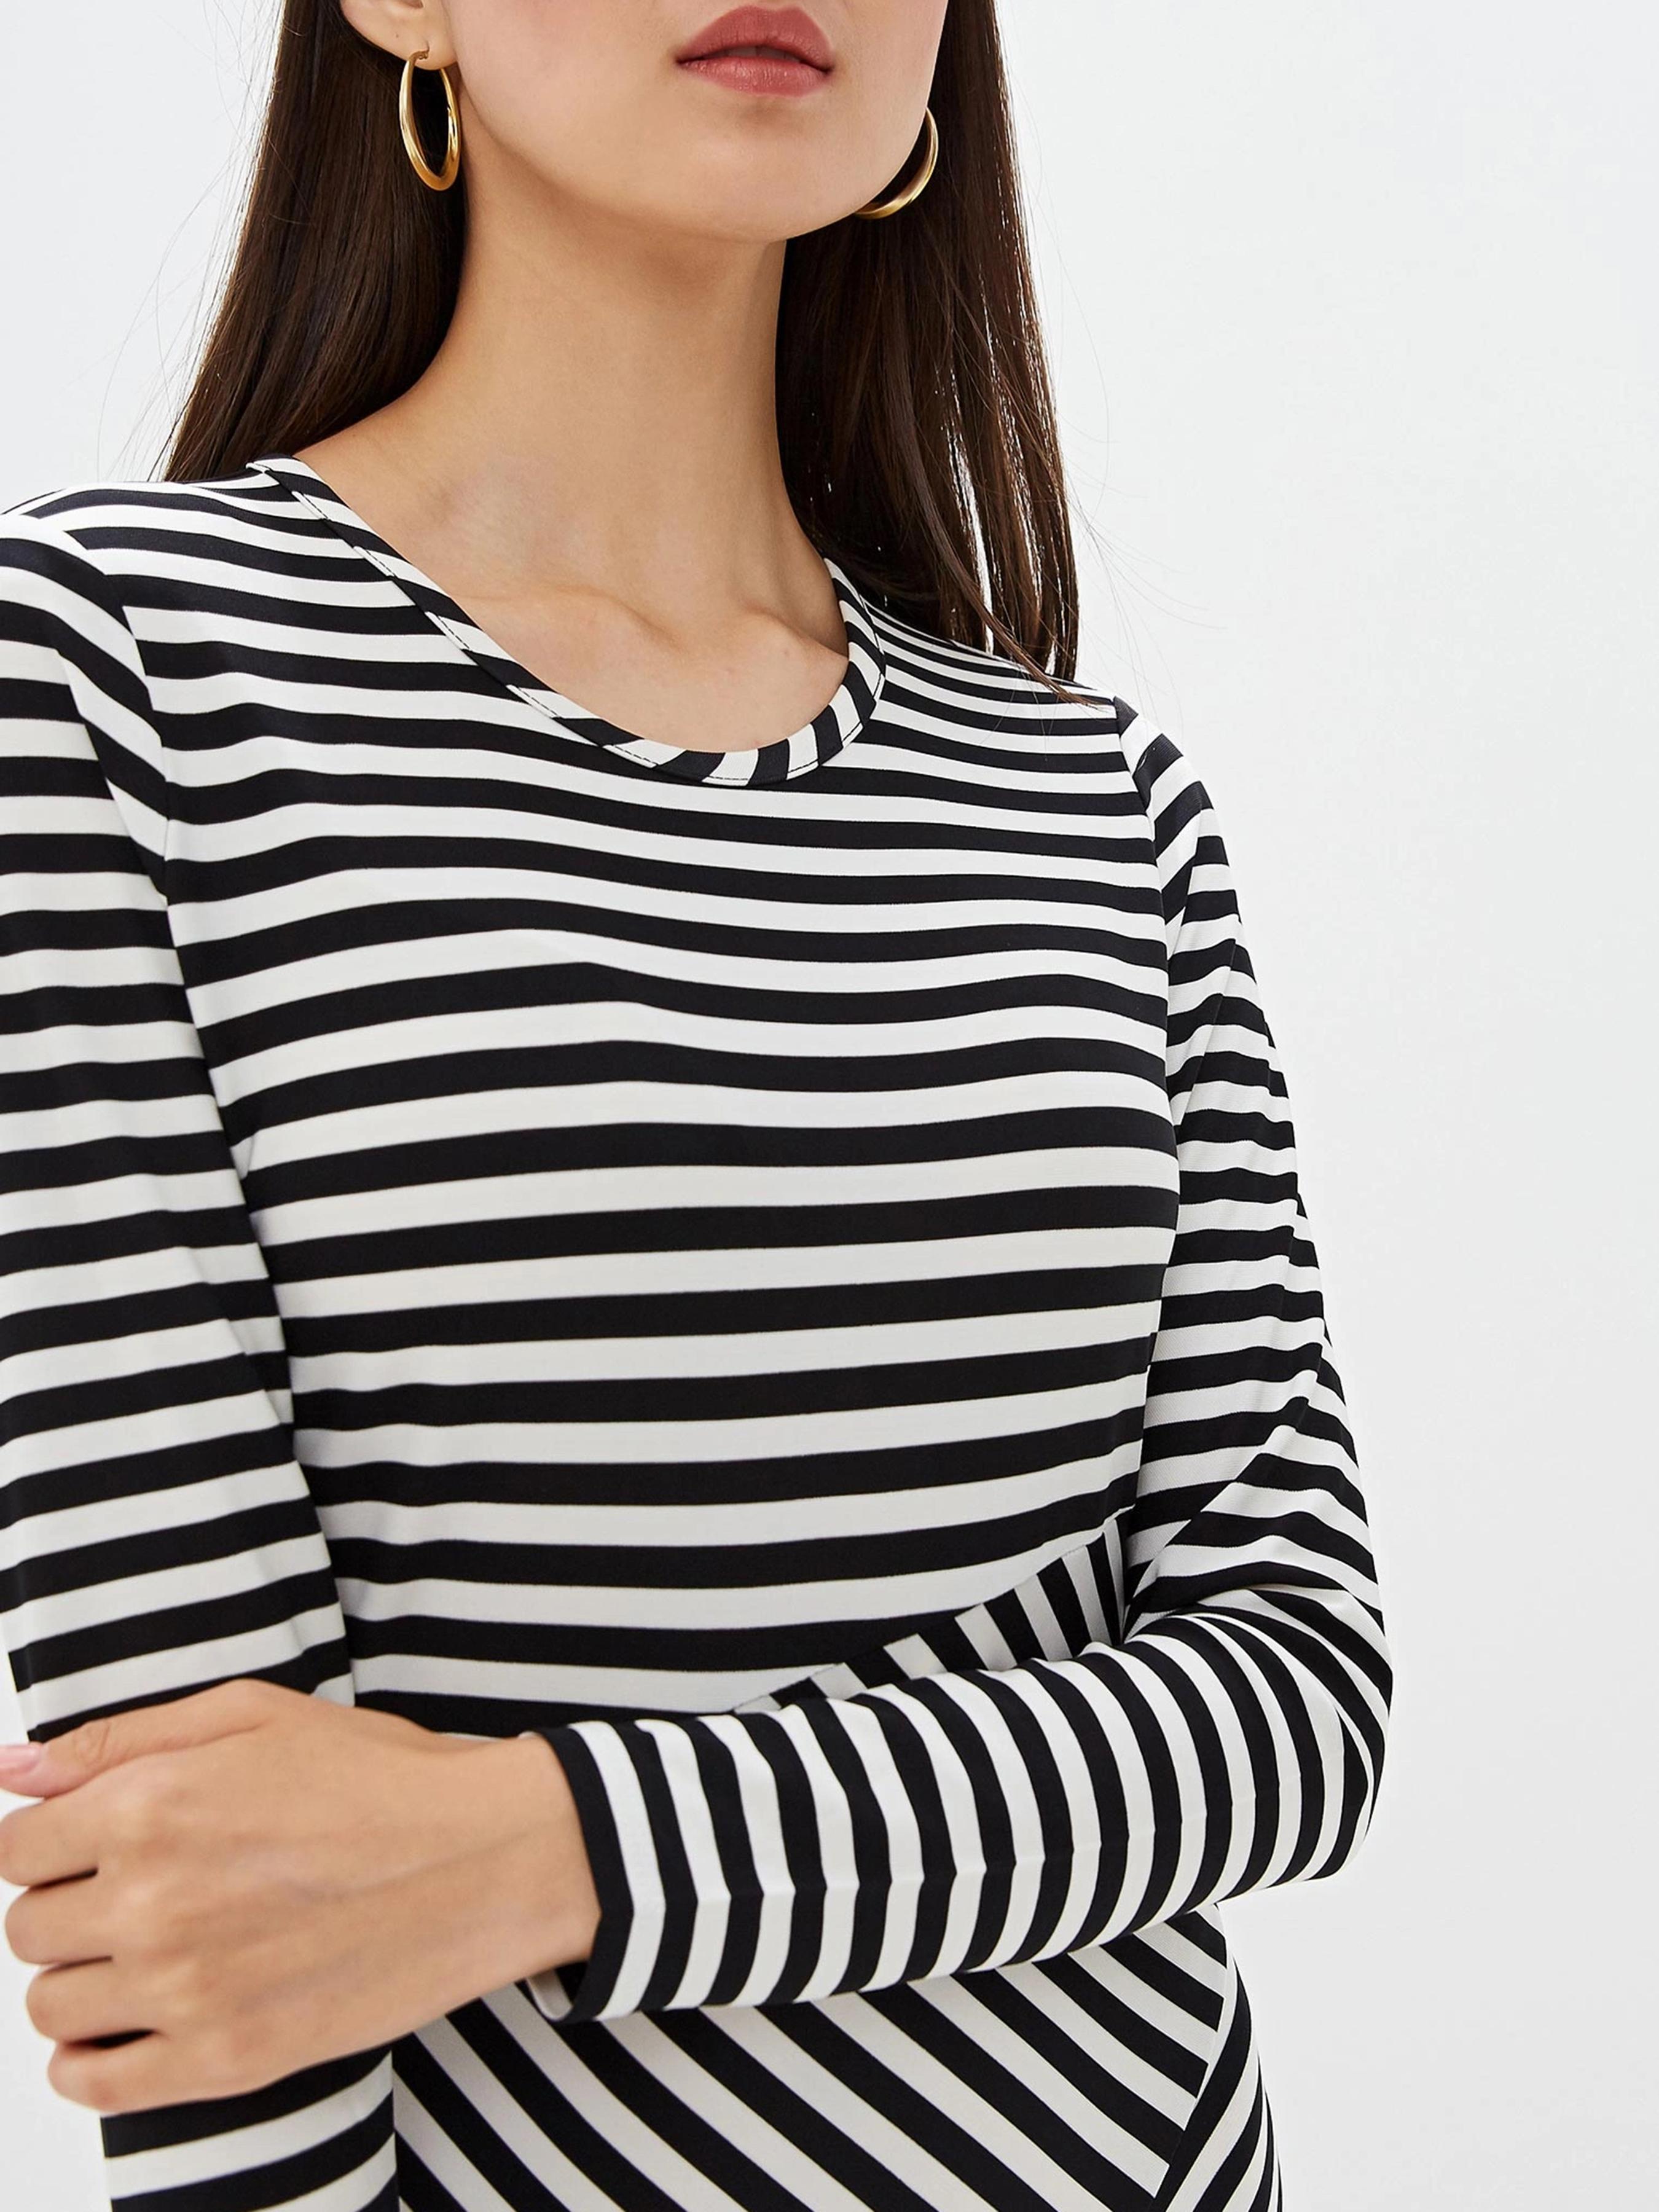 Платье женские Michael Kors модель MU98YYKBLF_620_128_0041 приобрести, 2017